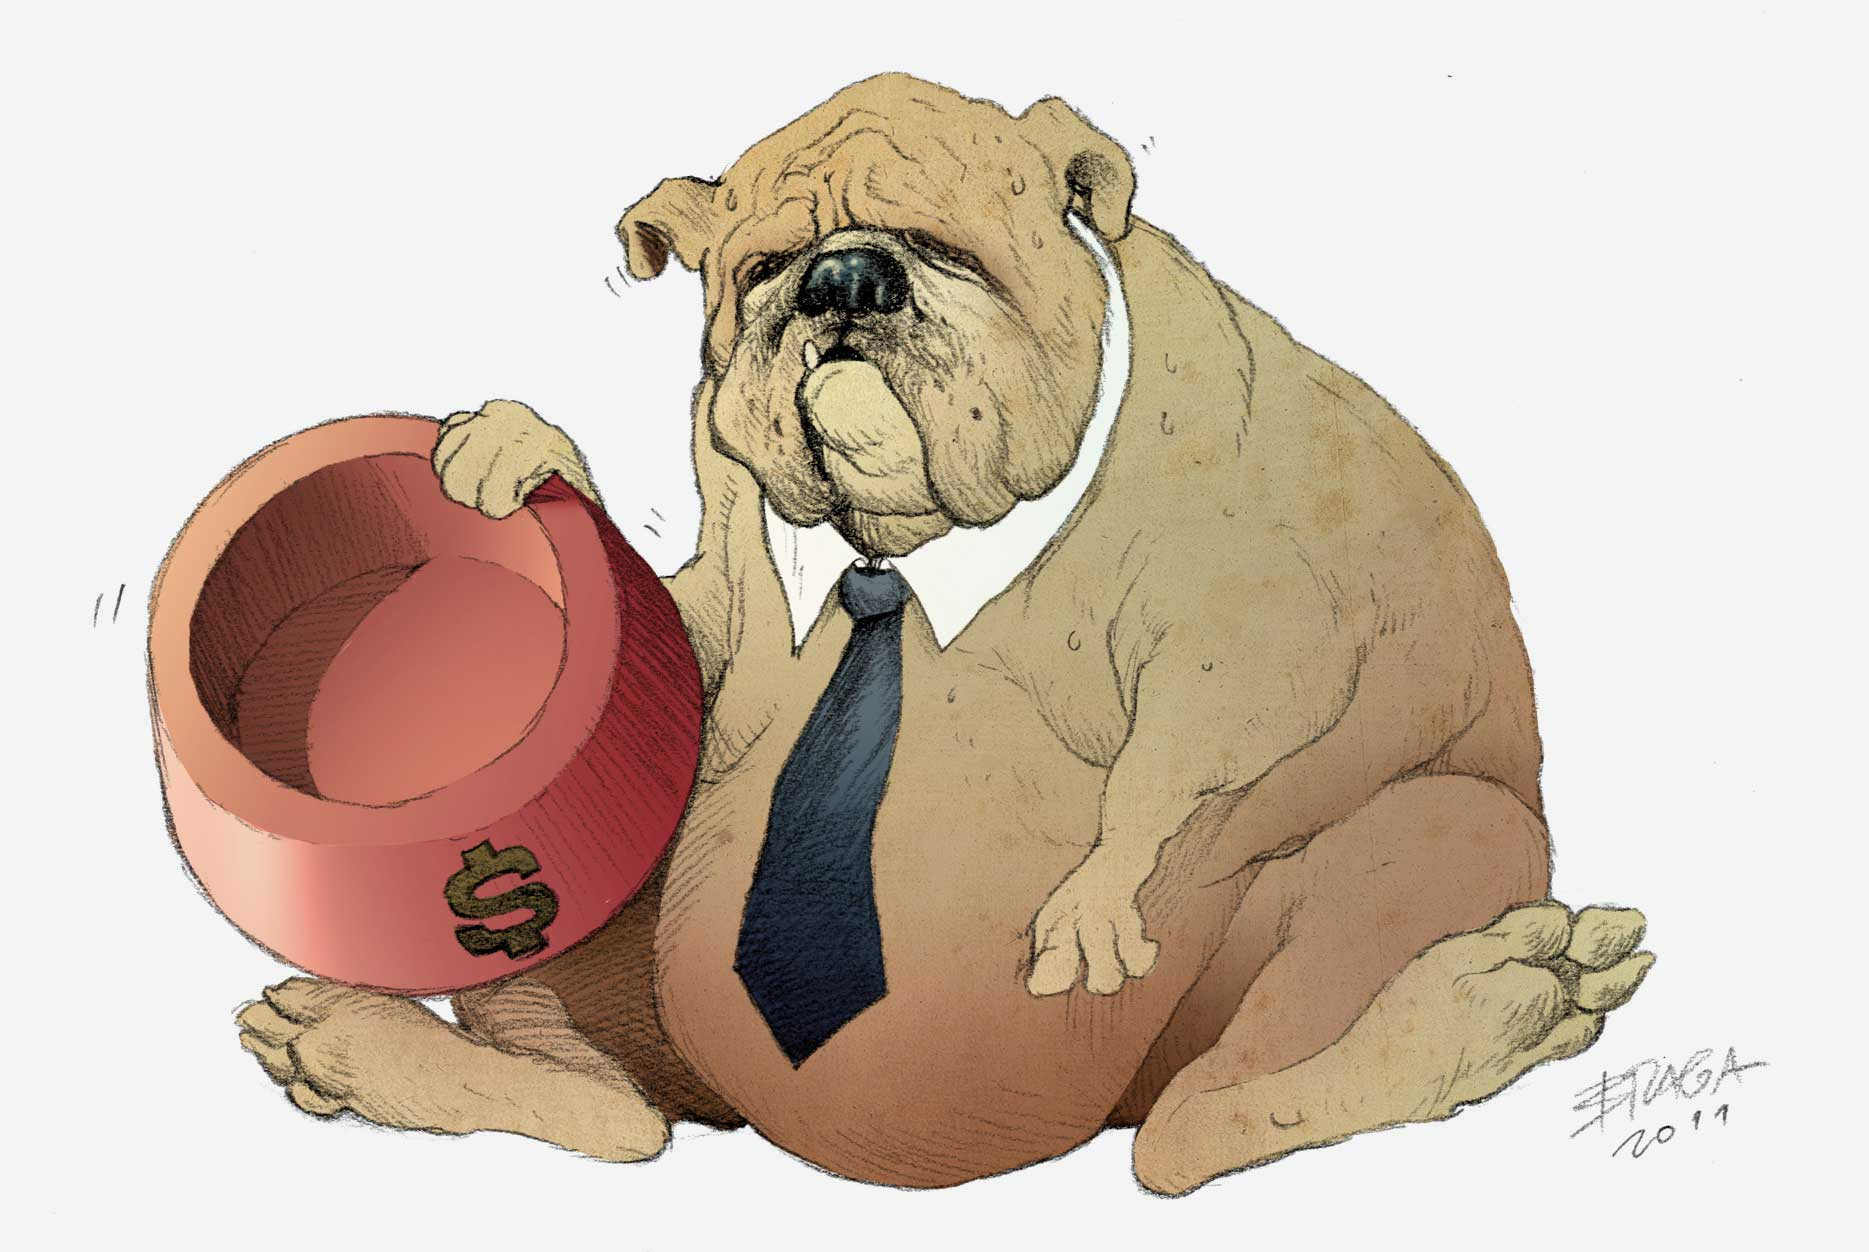 cachorro-coxa-midia-social-diburros-braga